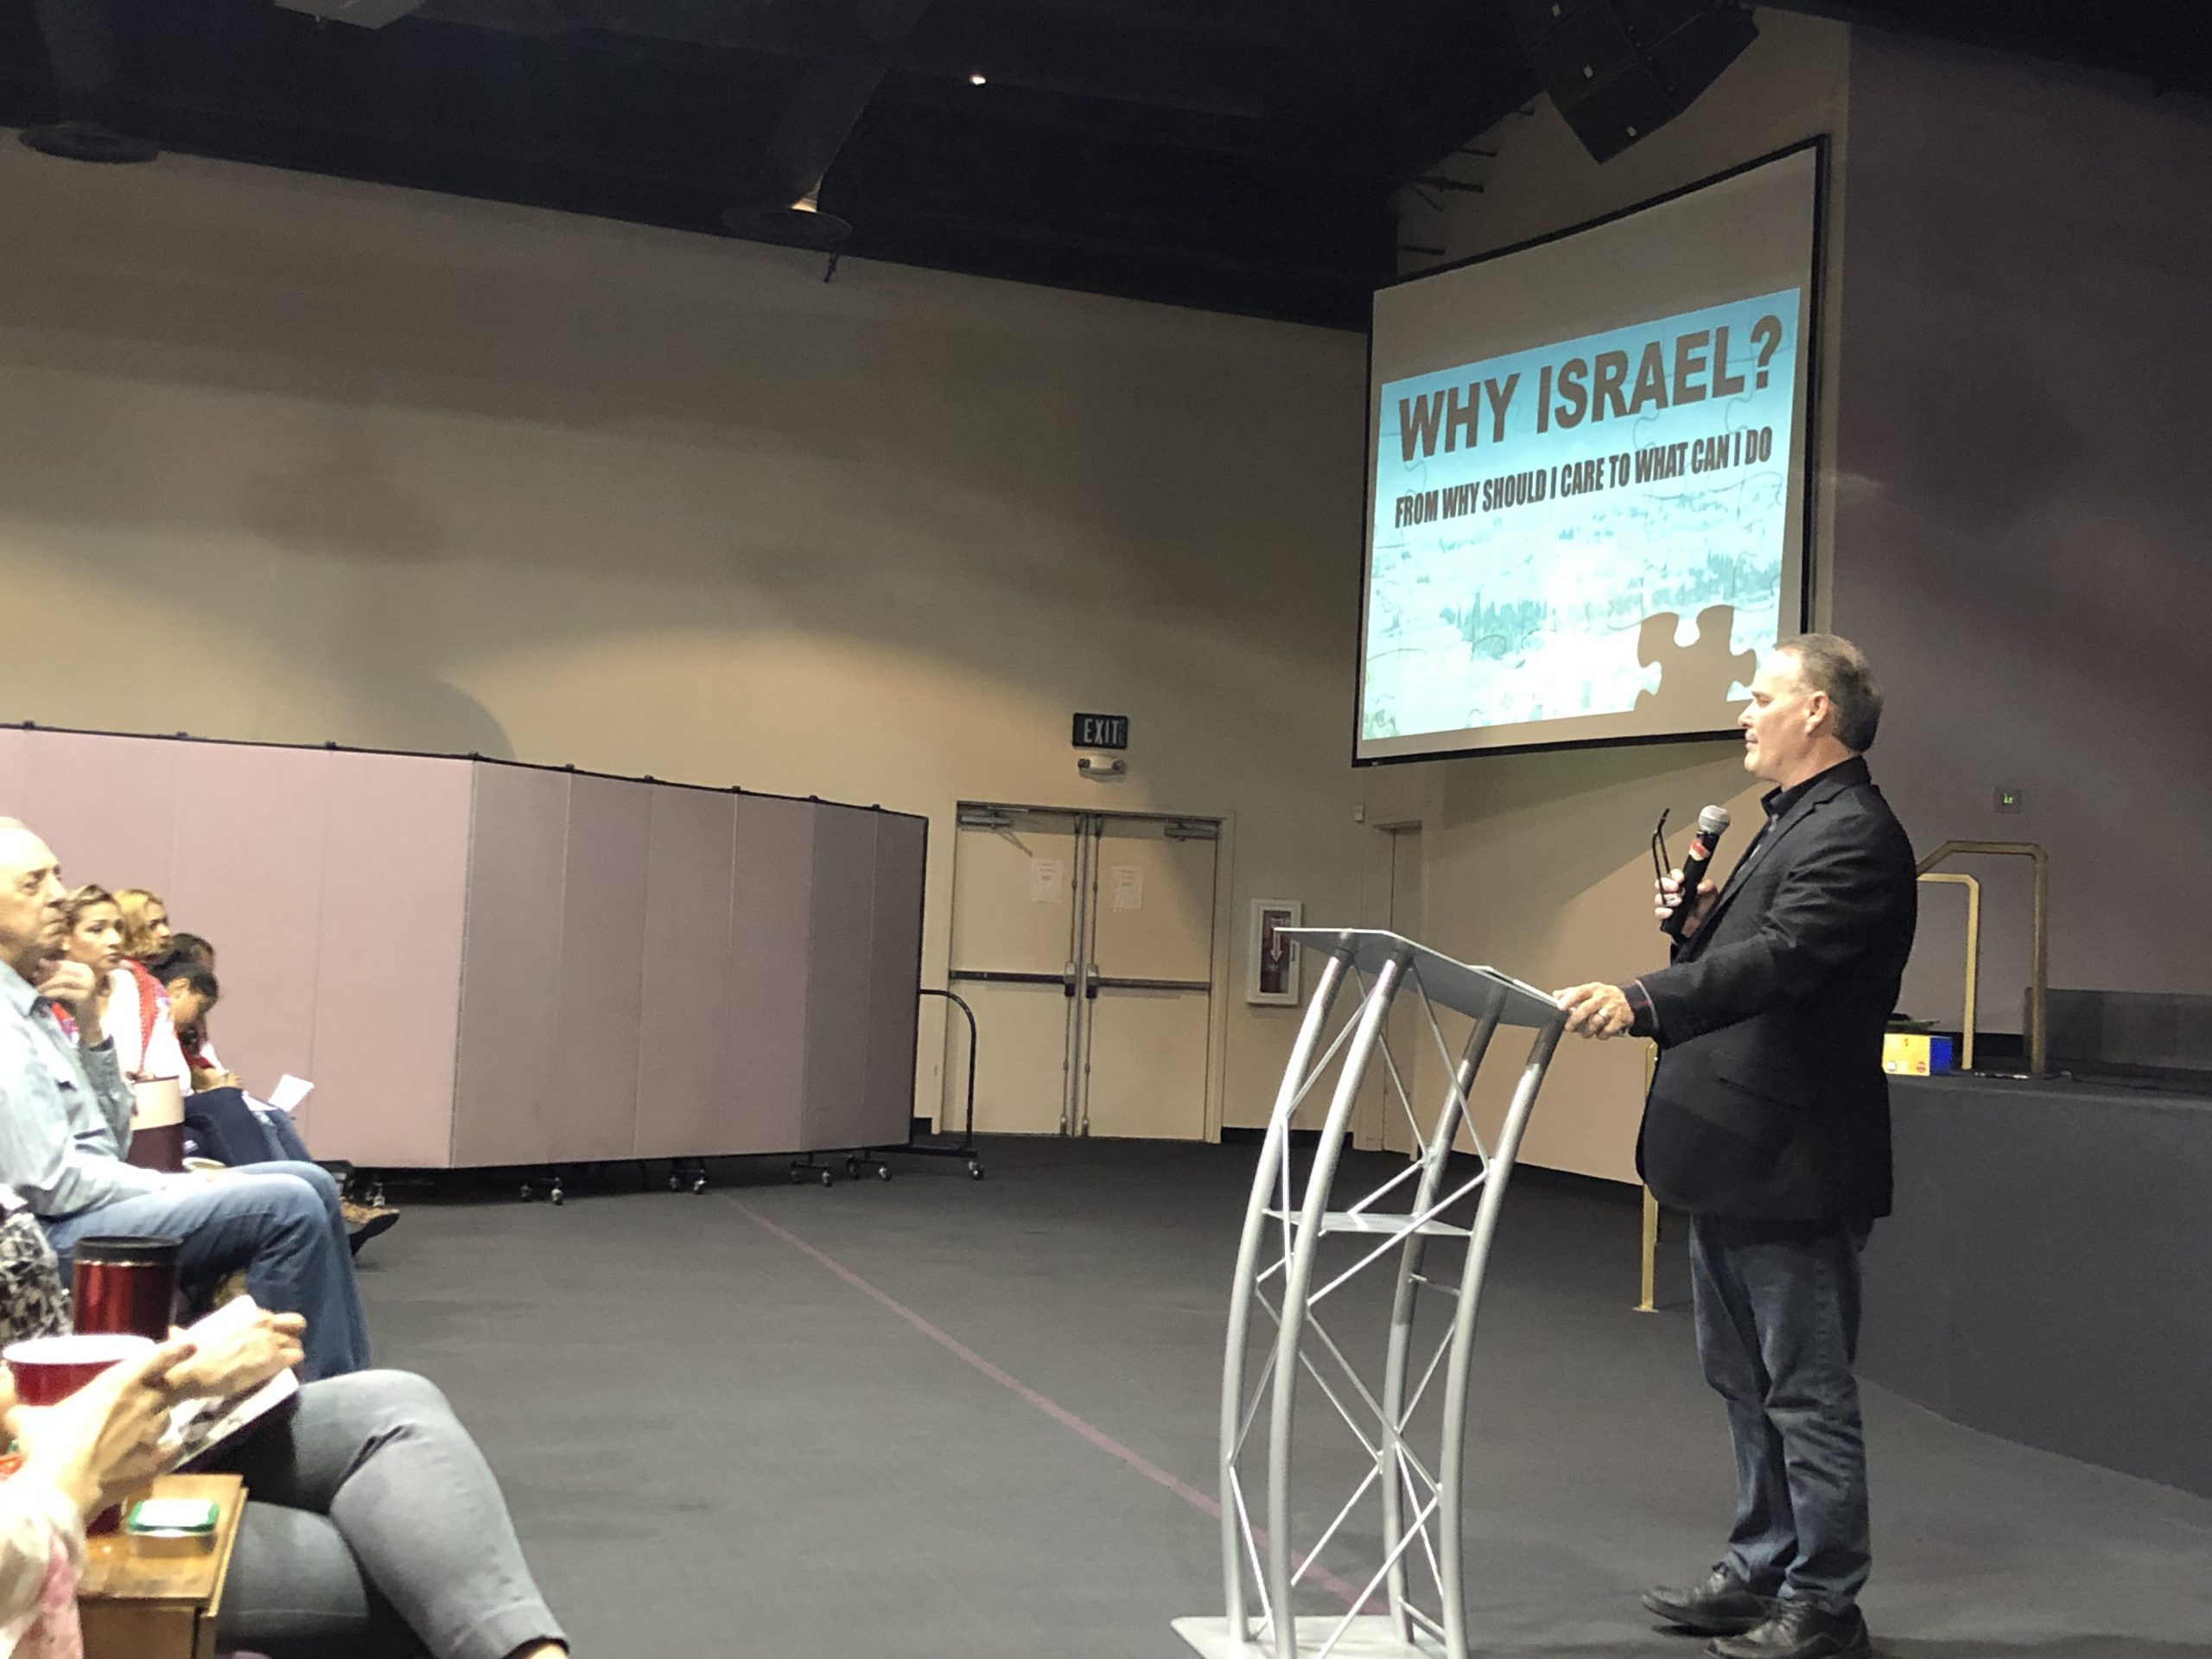 April 7 - Sanger, CA - Why Israel